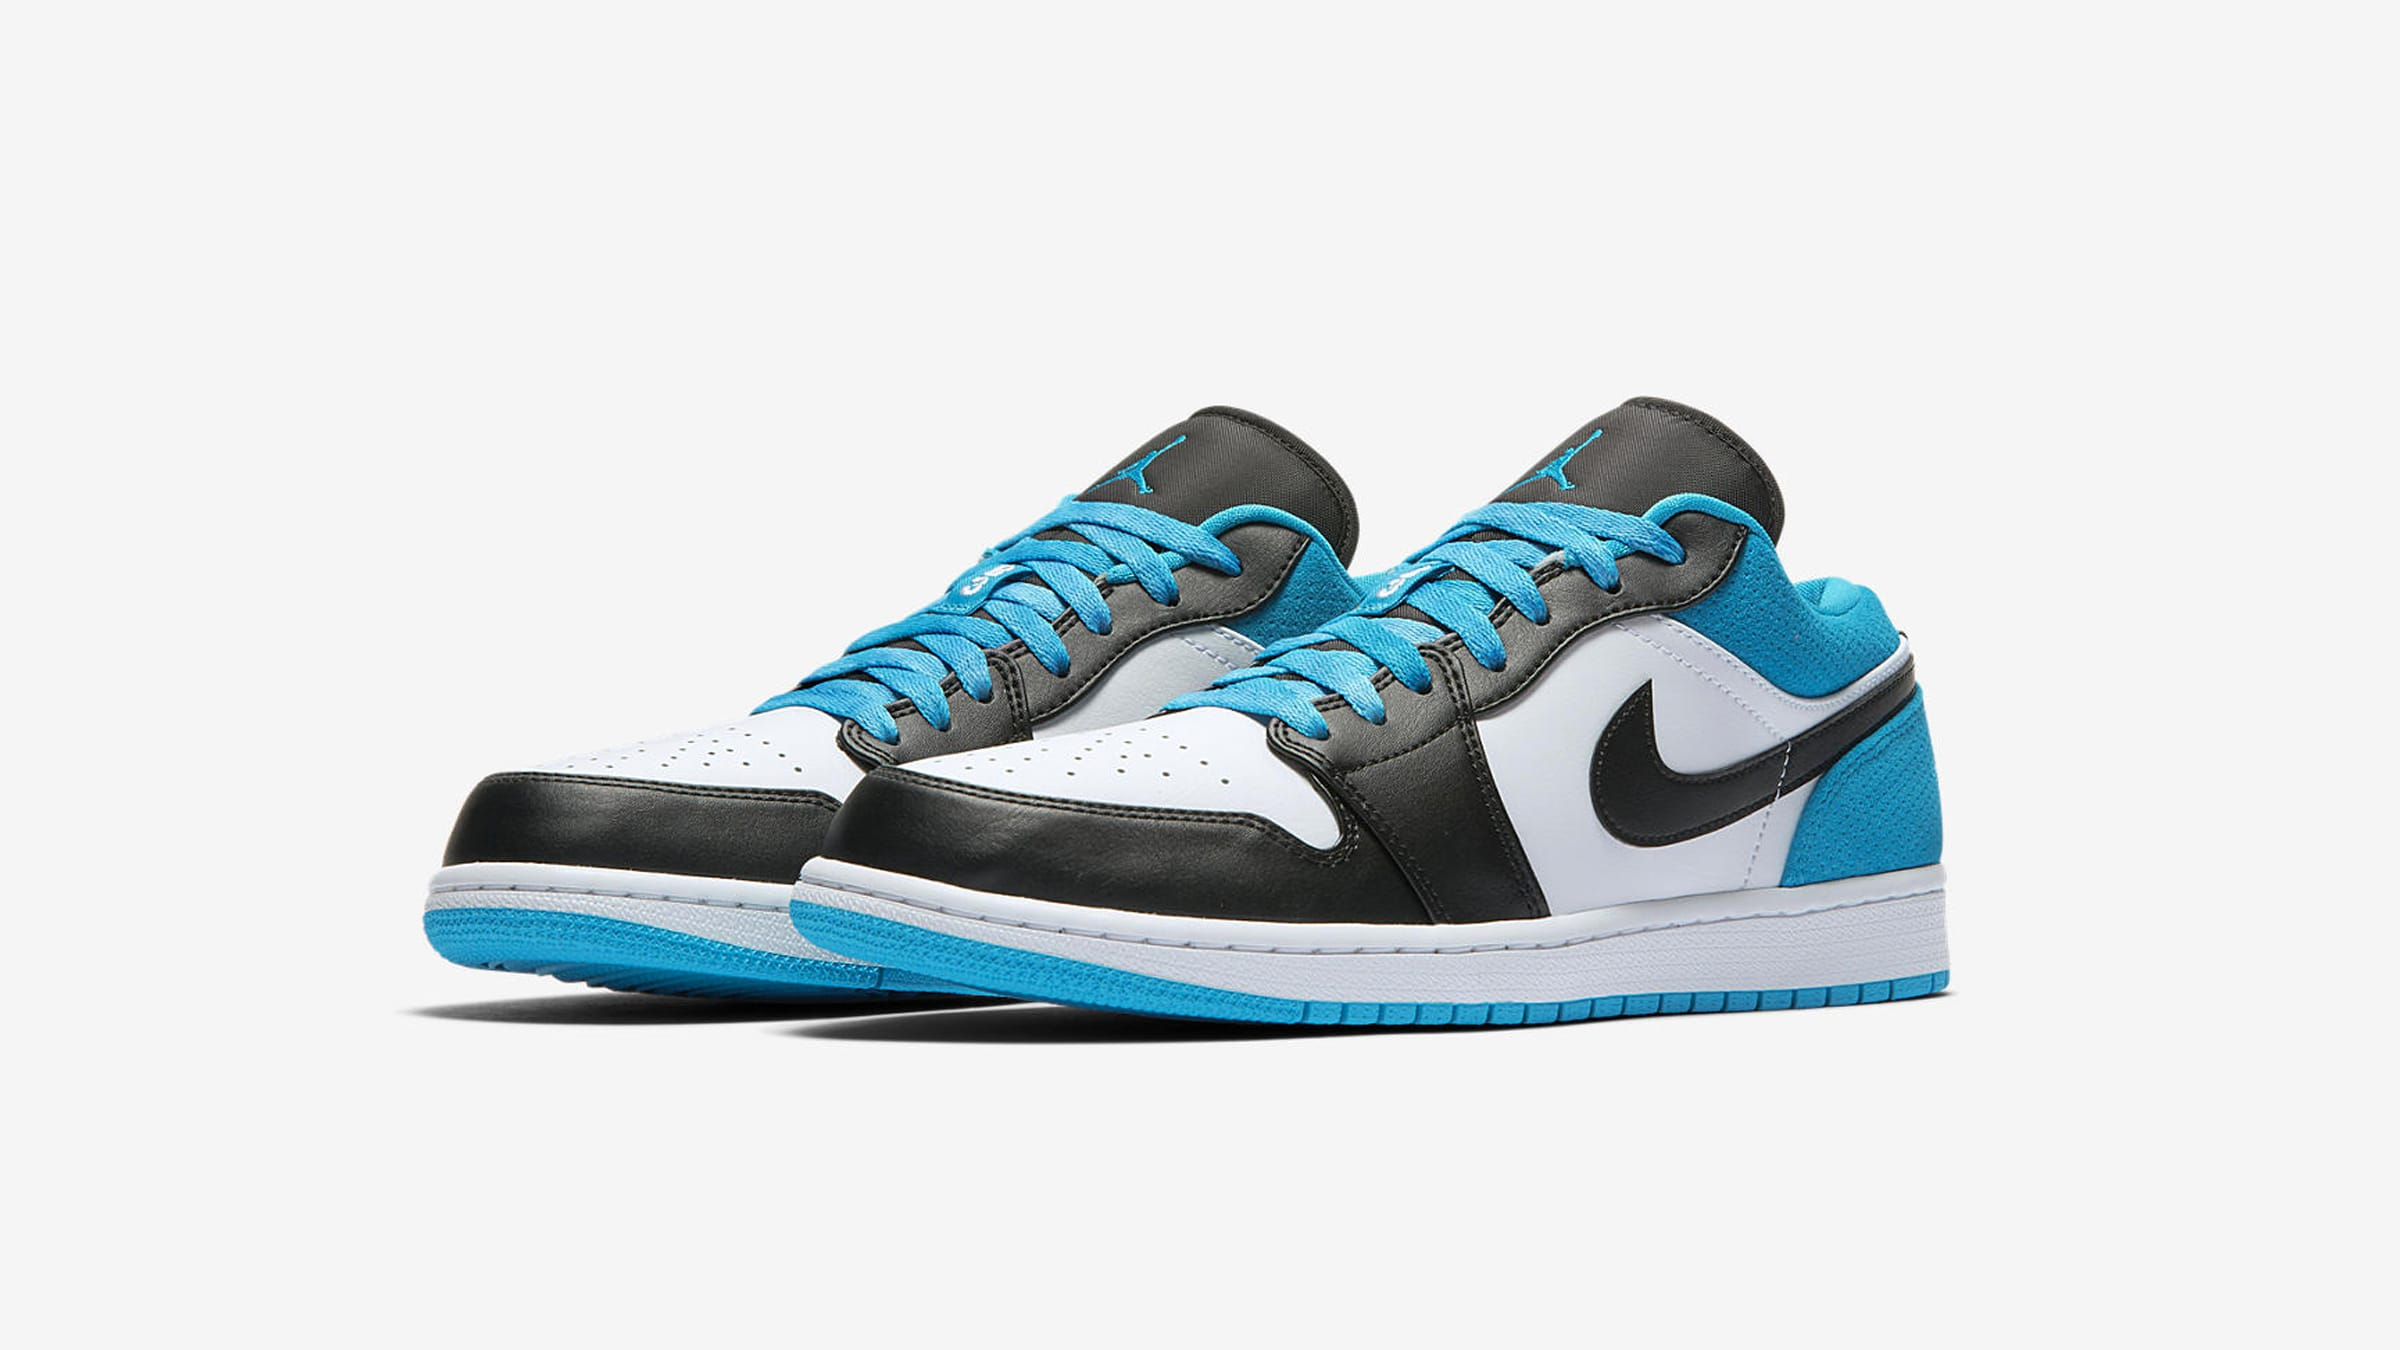 Nike Air Jordan 1 Low 'Laser Blue' - CK3022-004